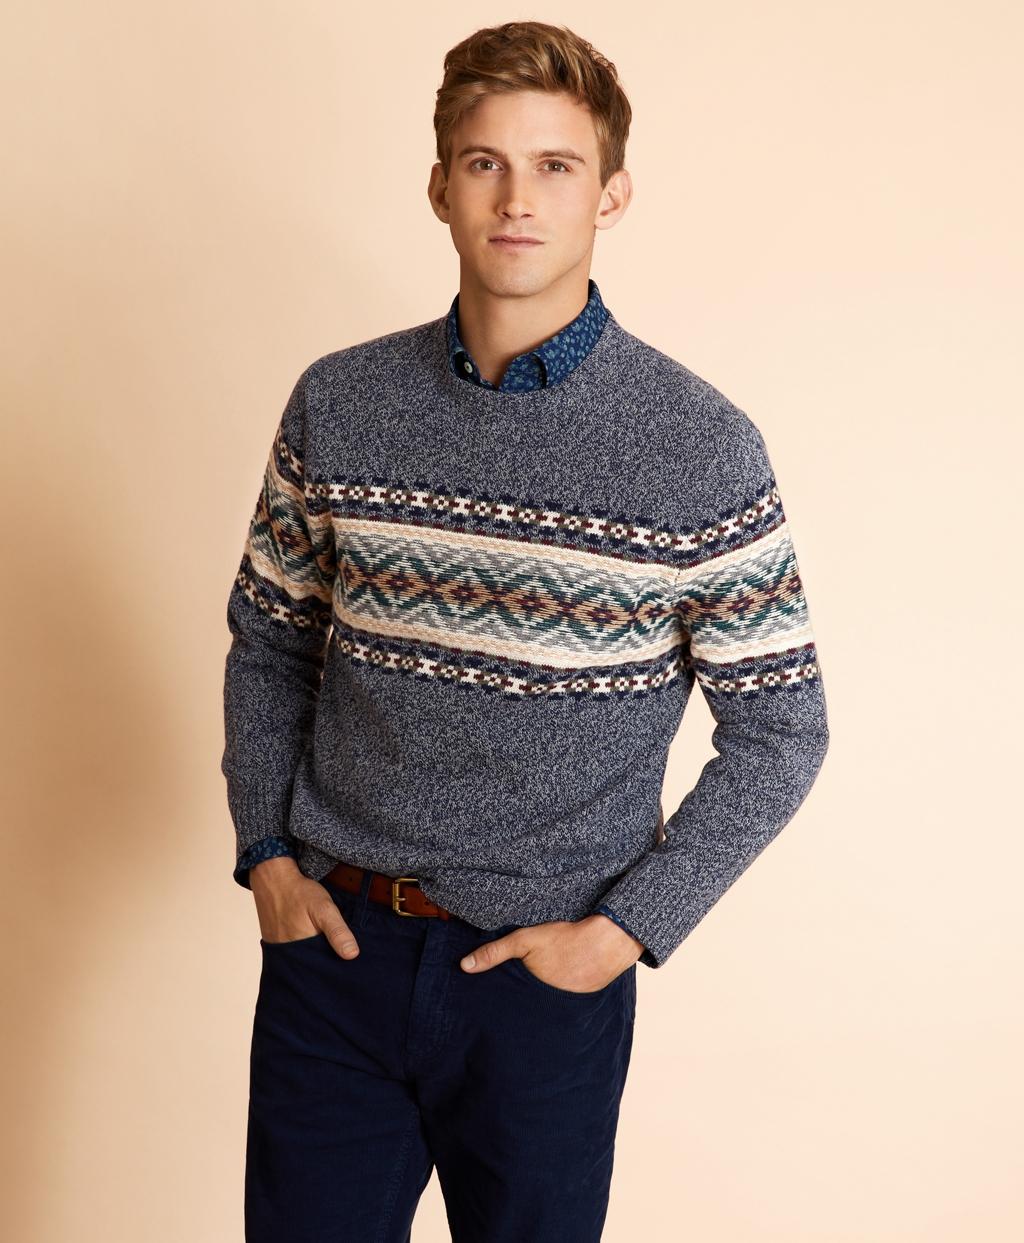 Men's Vintage Sweaters – 1920s to 1960s Retro Jumpers Brooks Brothers Mens Wool-Blend Fair Isle Crewneck Sweater $89.50 AT vintagedancer.com